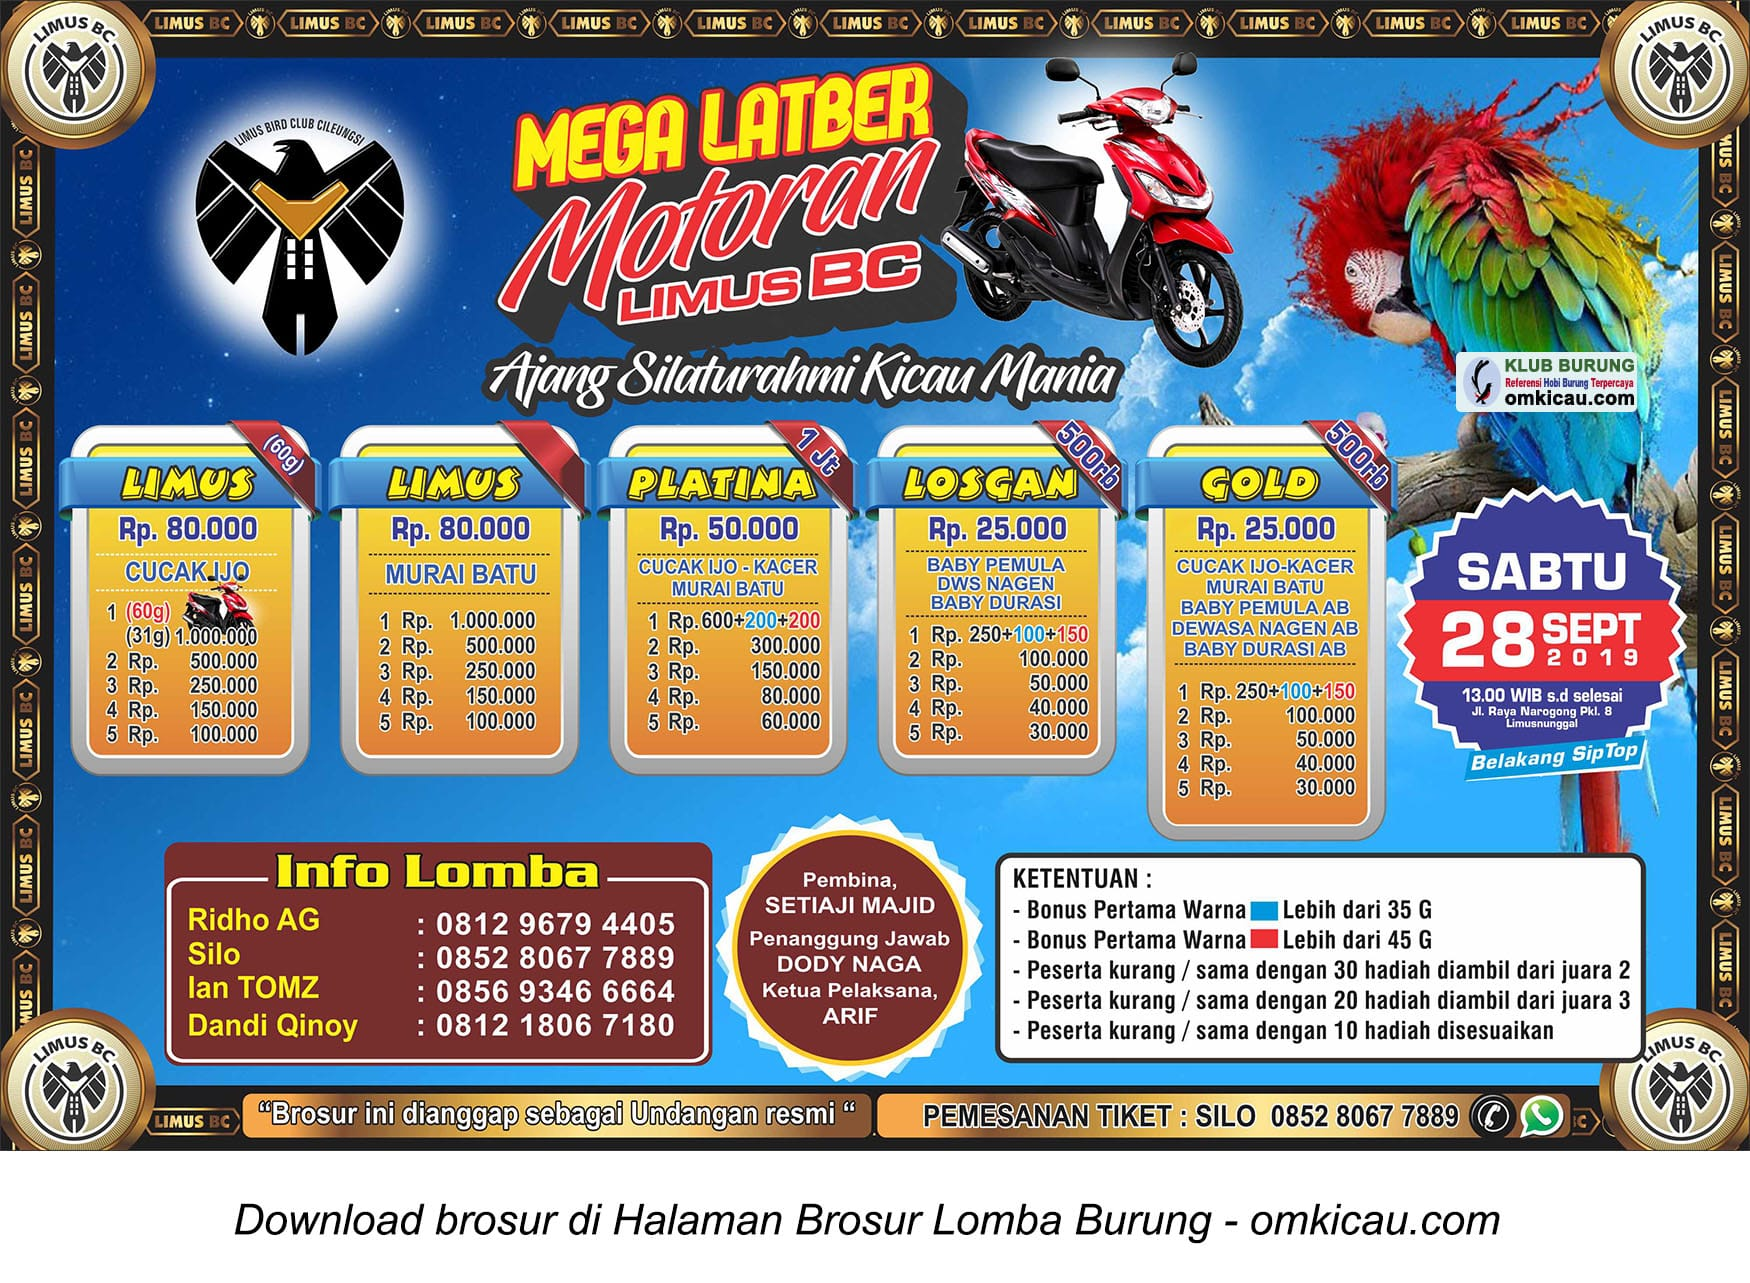 Mega Latber September Motoran